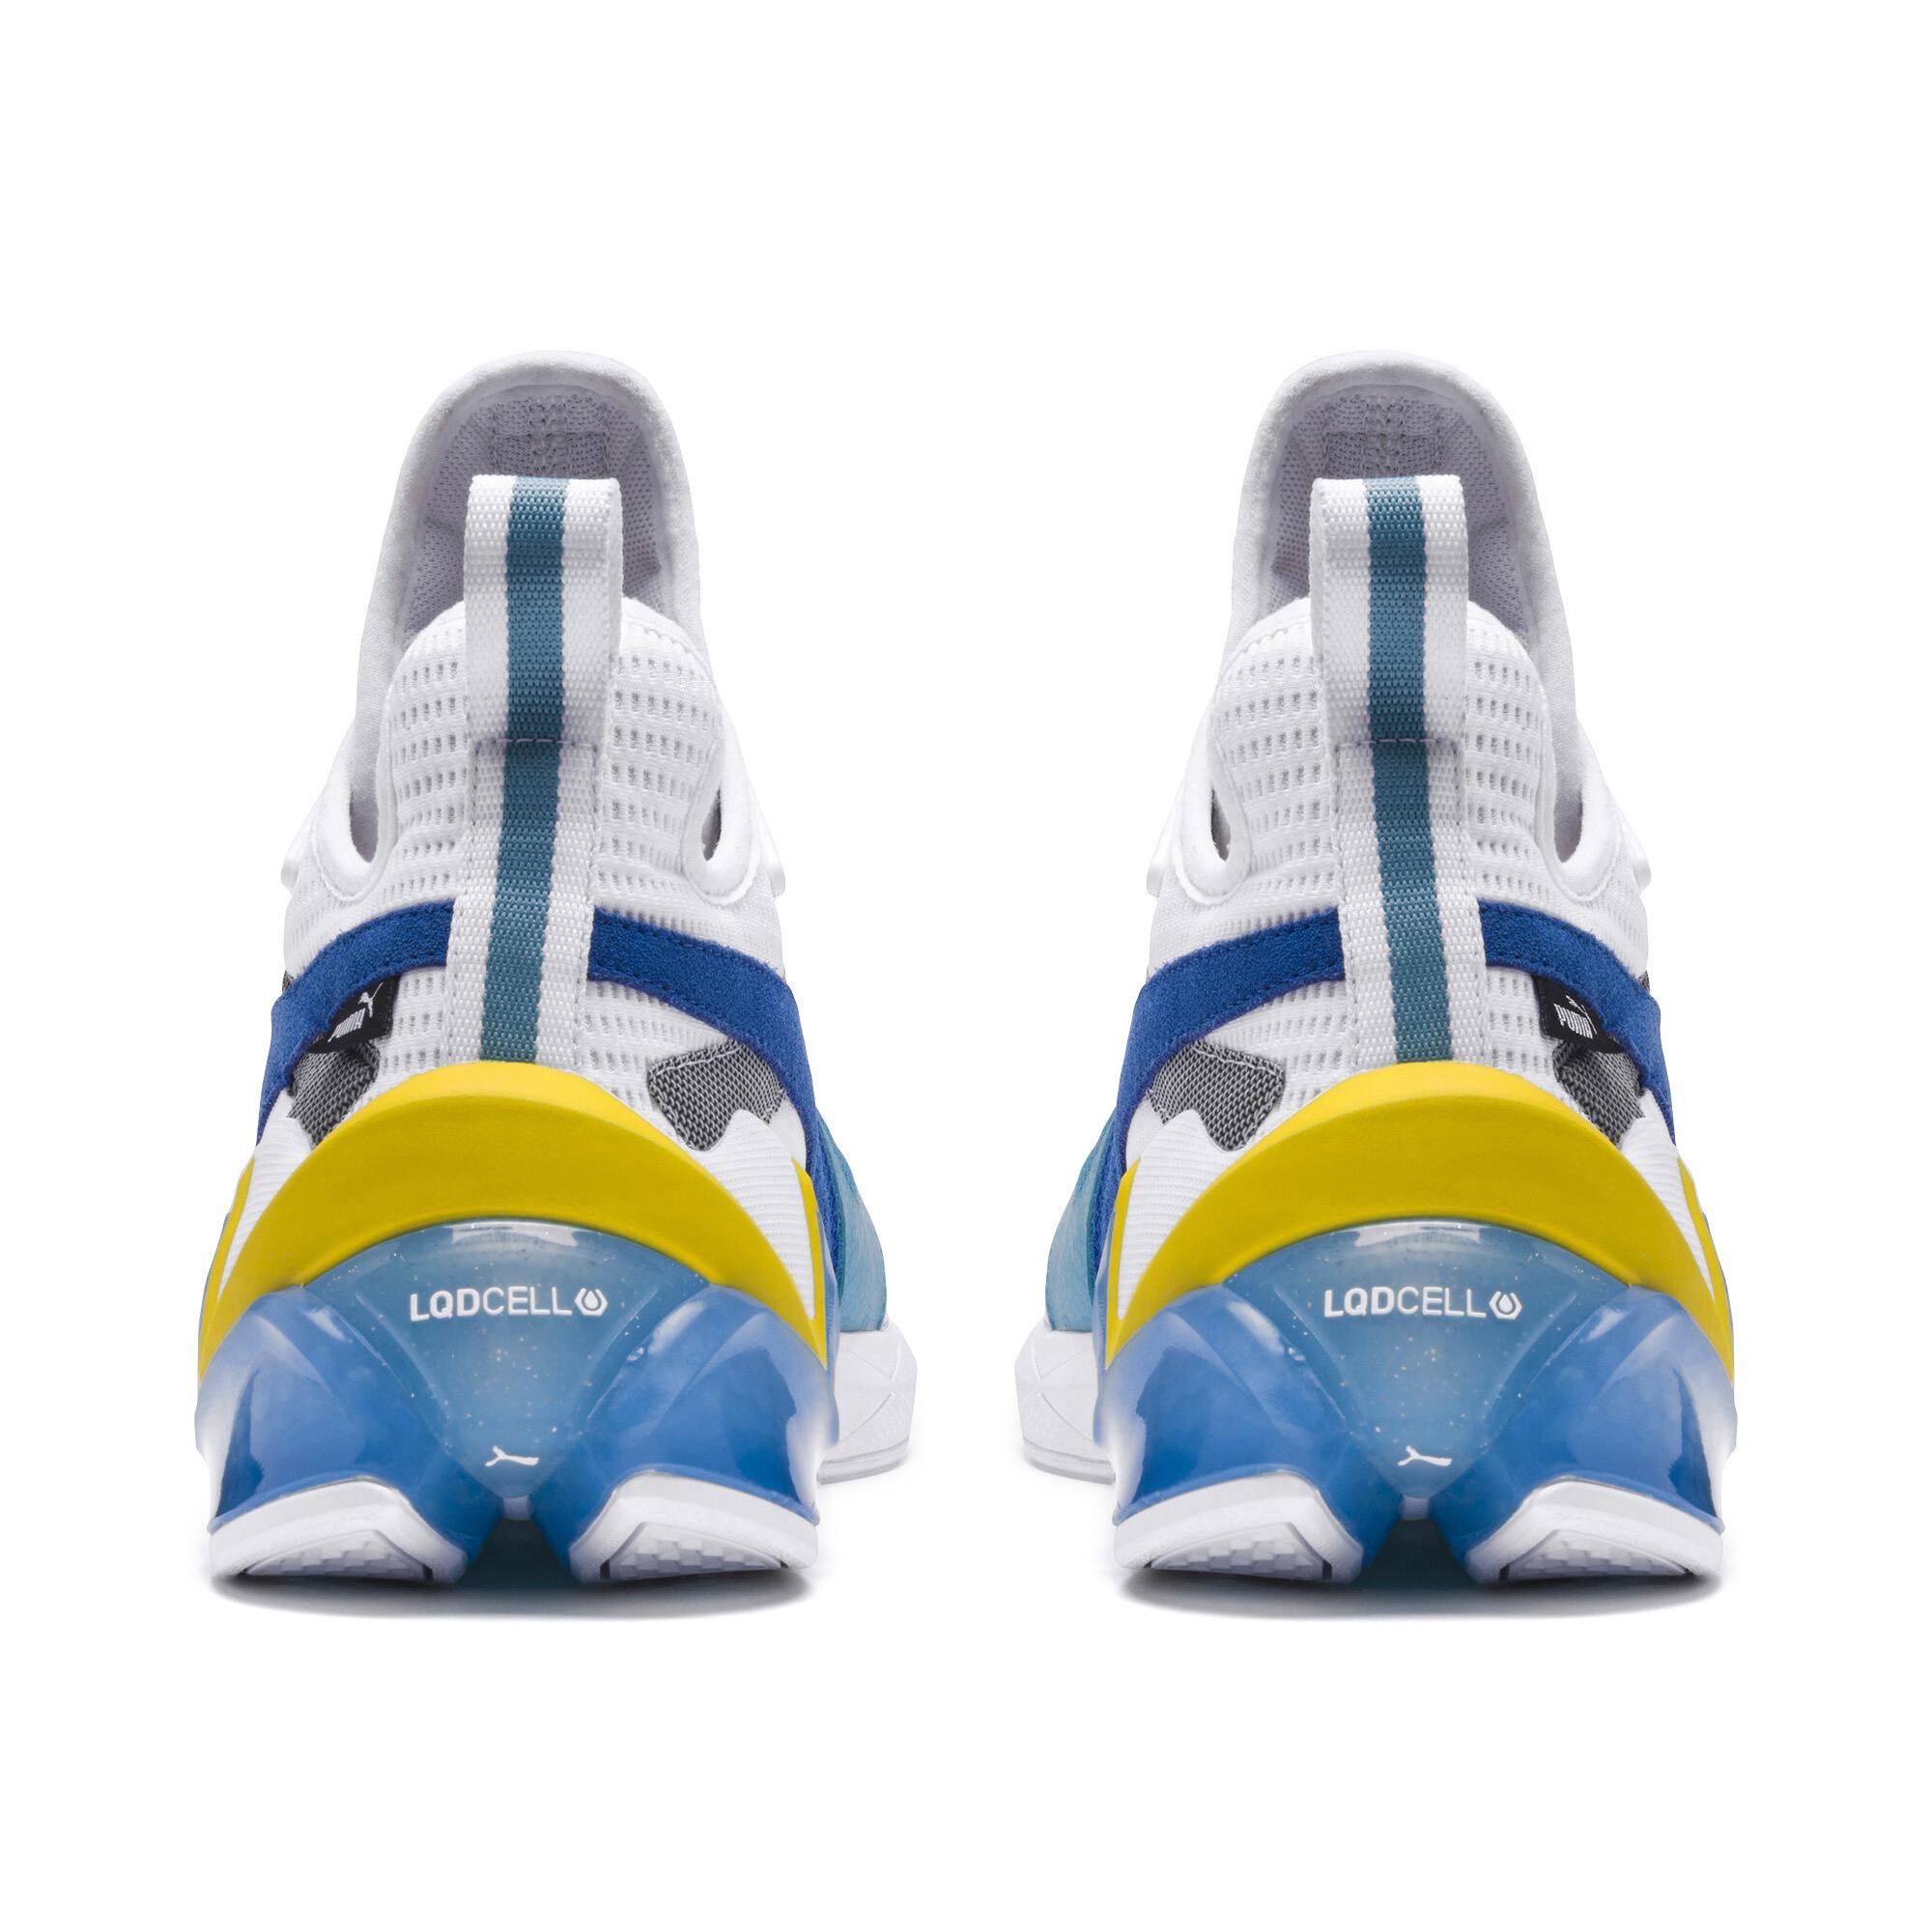 PUMA-Men-039-s-LQDCELL-Origin-Training-Shoes thumbnail 3